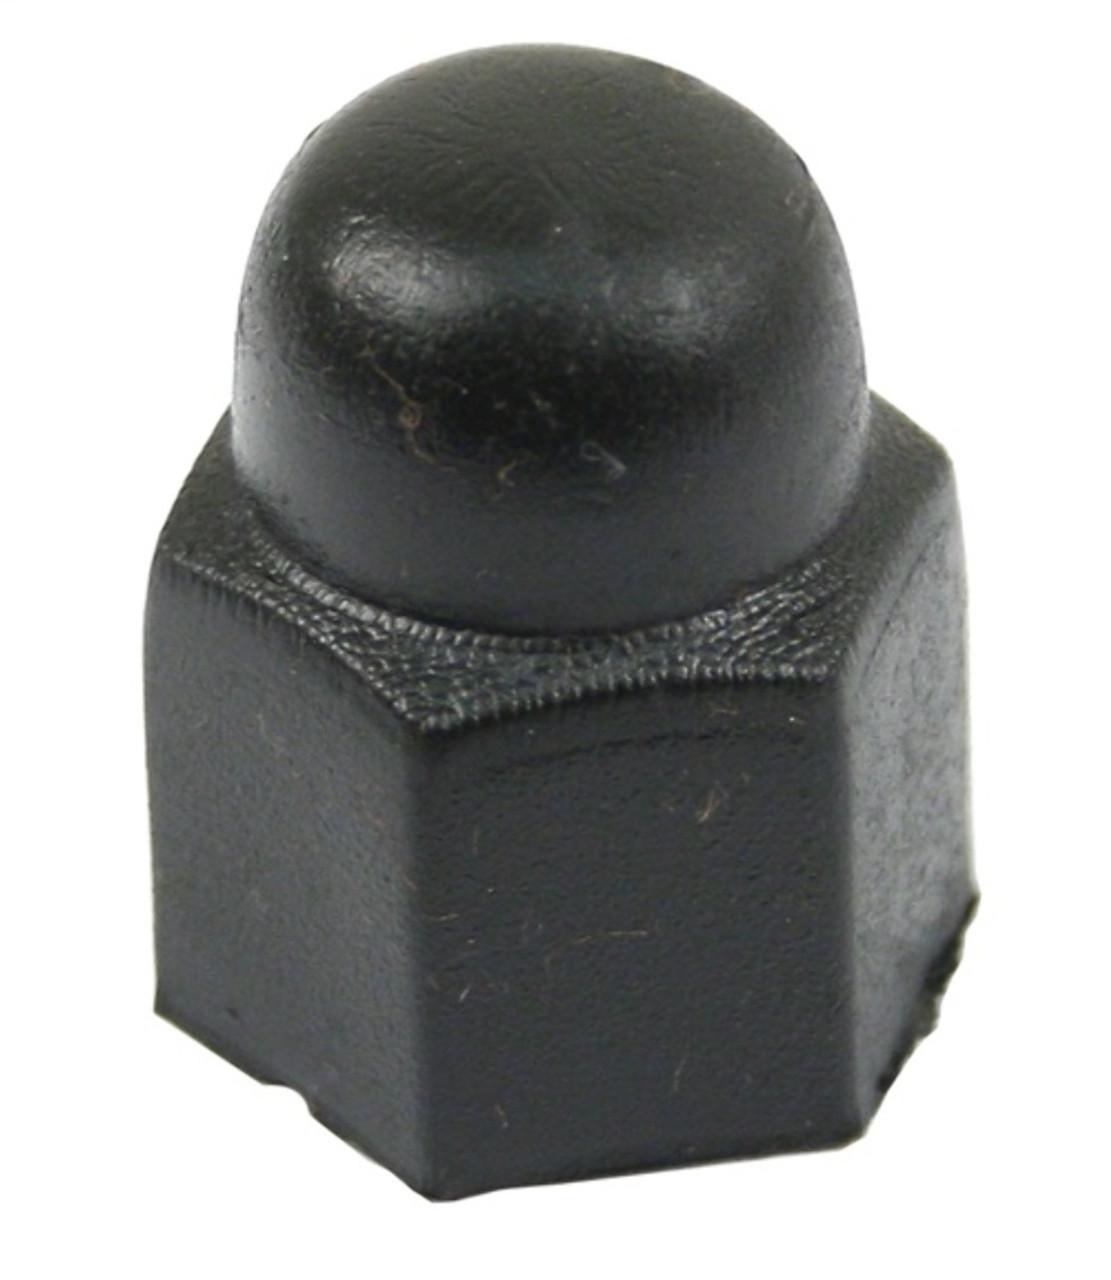 111 601 173 Cap, (Black) Wheel Bolt, VW Type 1 1973-79, Each - EMPI 98-6113-B